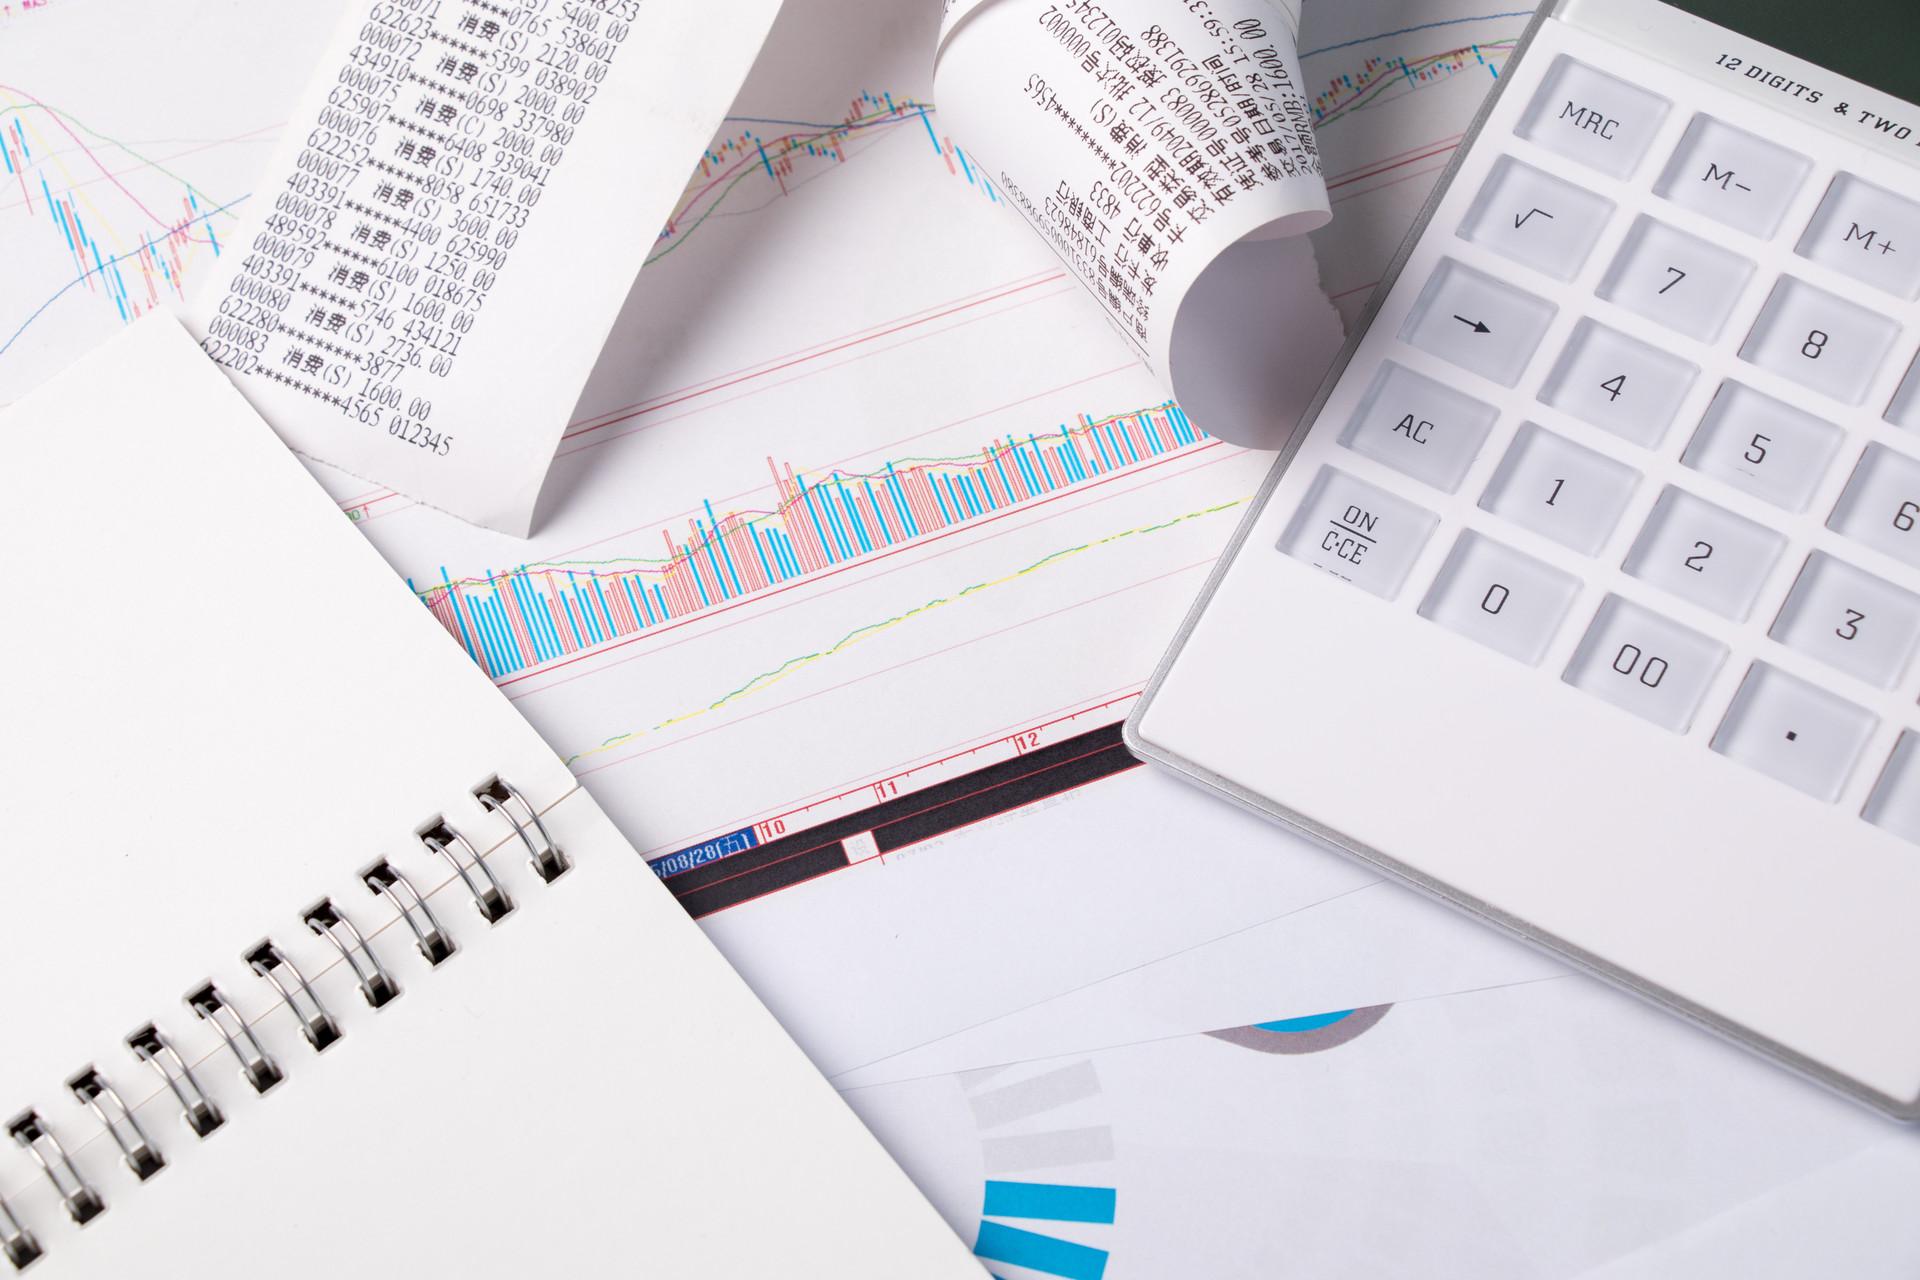 HR对员工的背景进行调查一般会怎么做